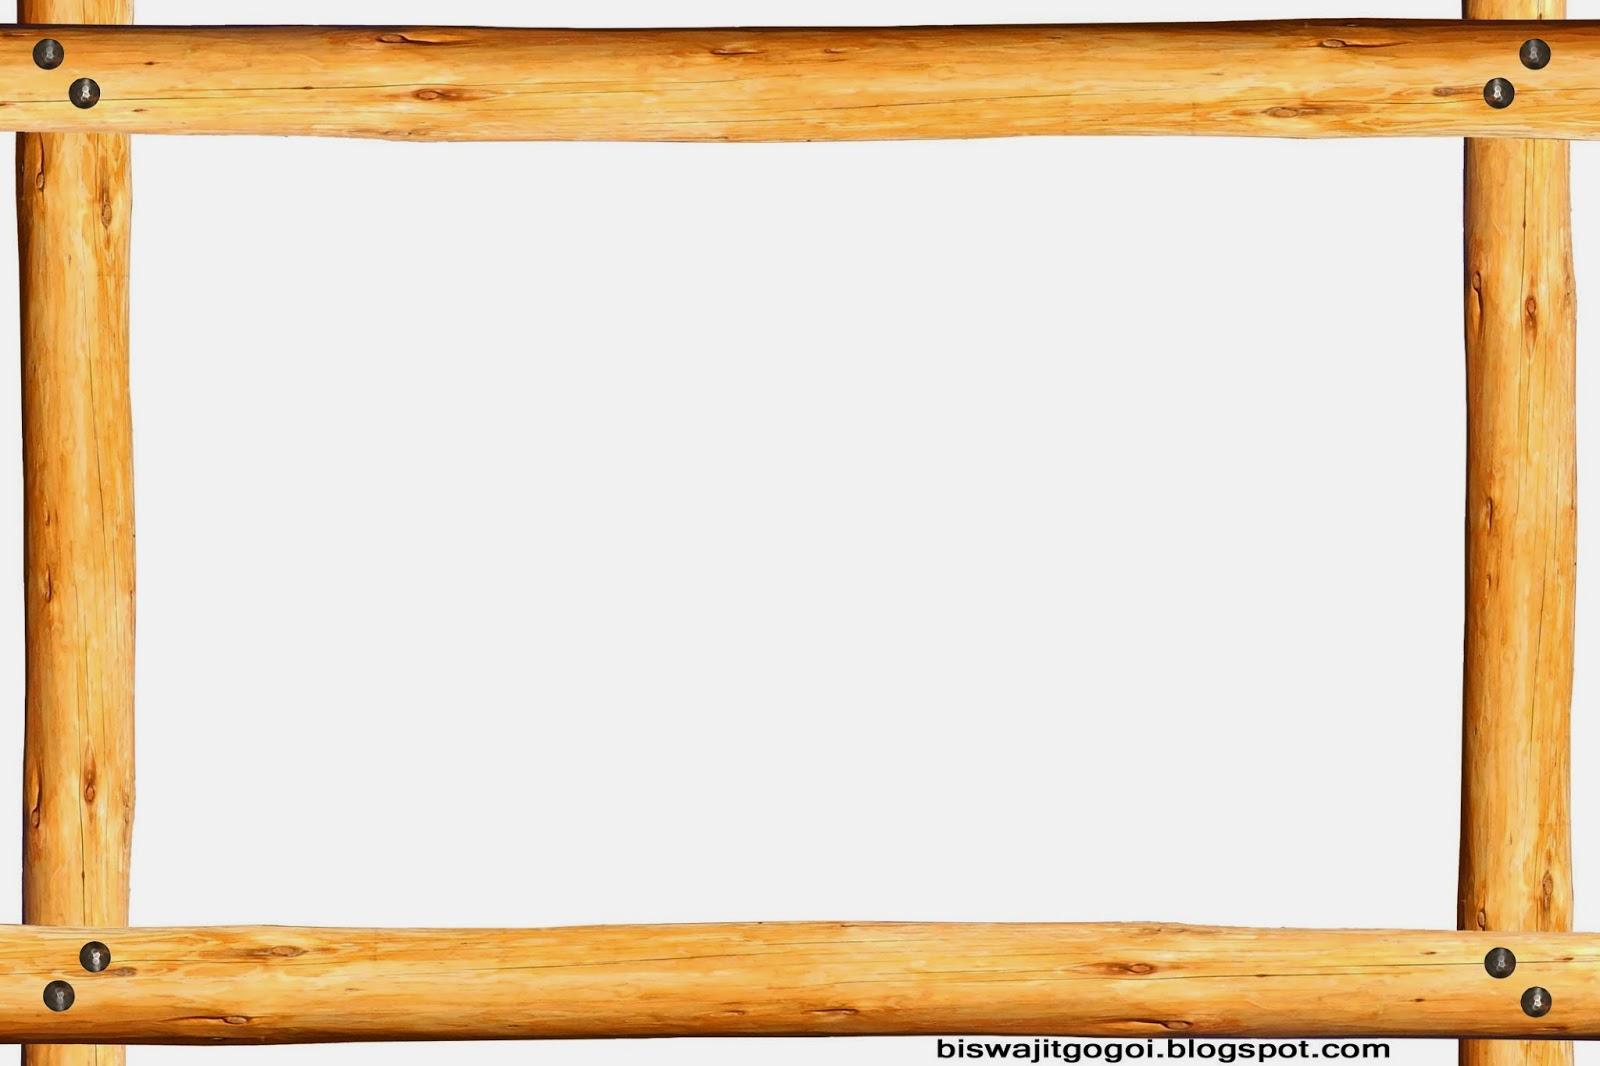 Free Log Cliparts Border, Download Free Clip Art, Free Clip.